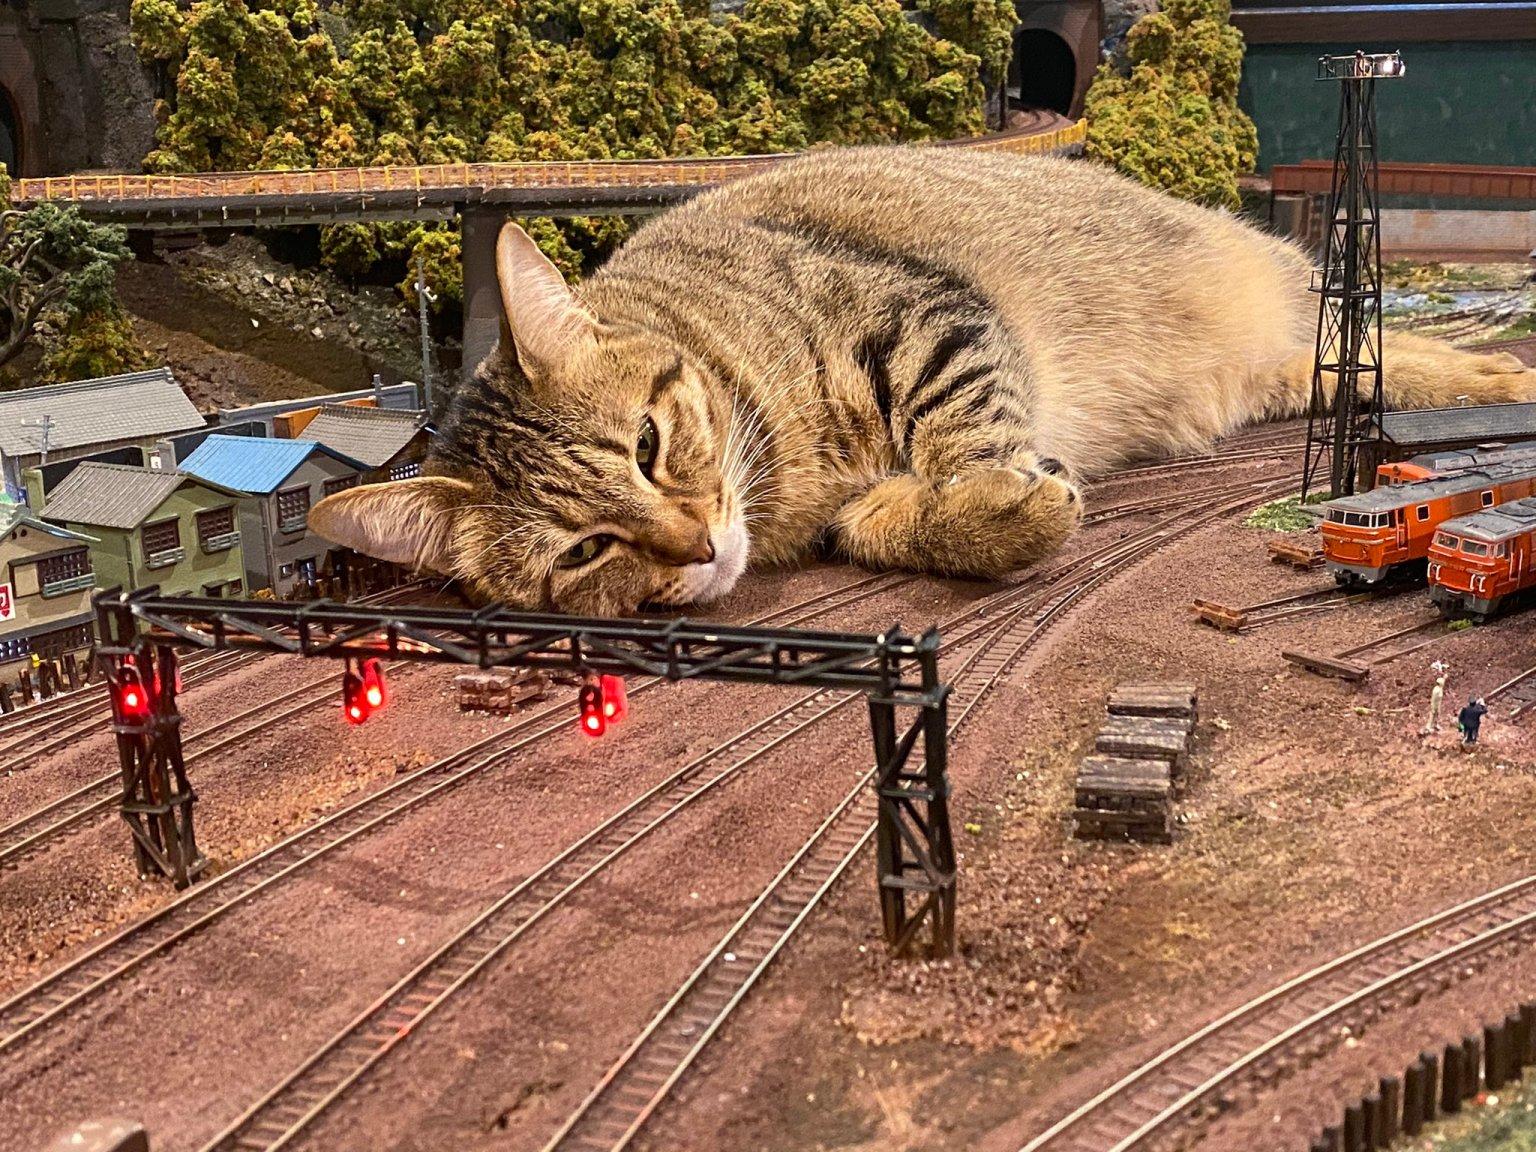 Giant Cat Takes Nap on Railroad Tracks